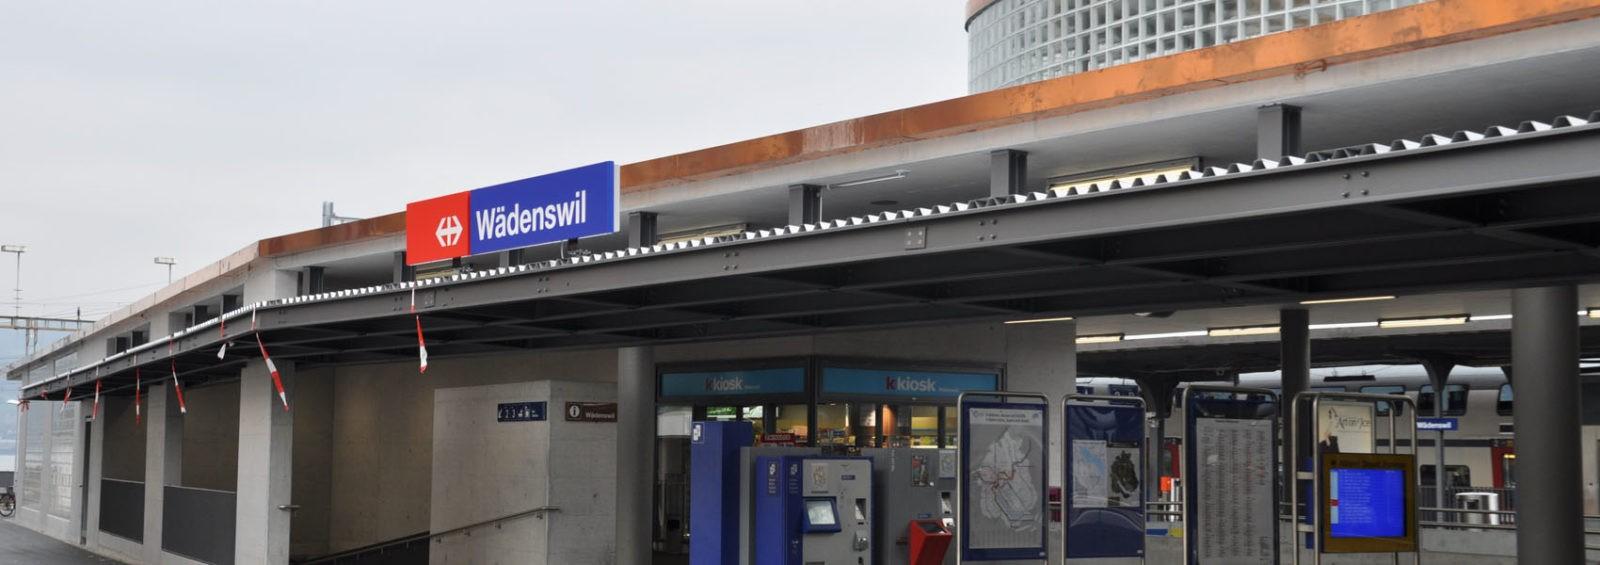 kiosk_waedenswill_eye